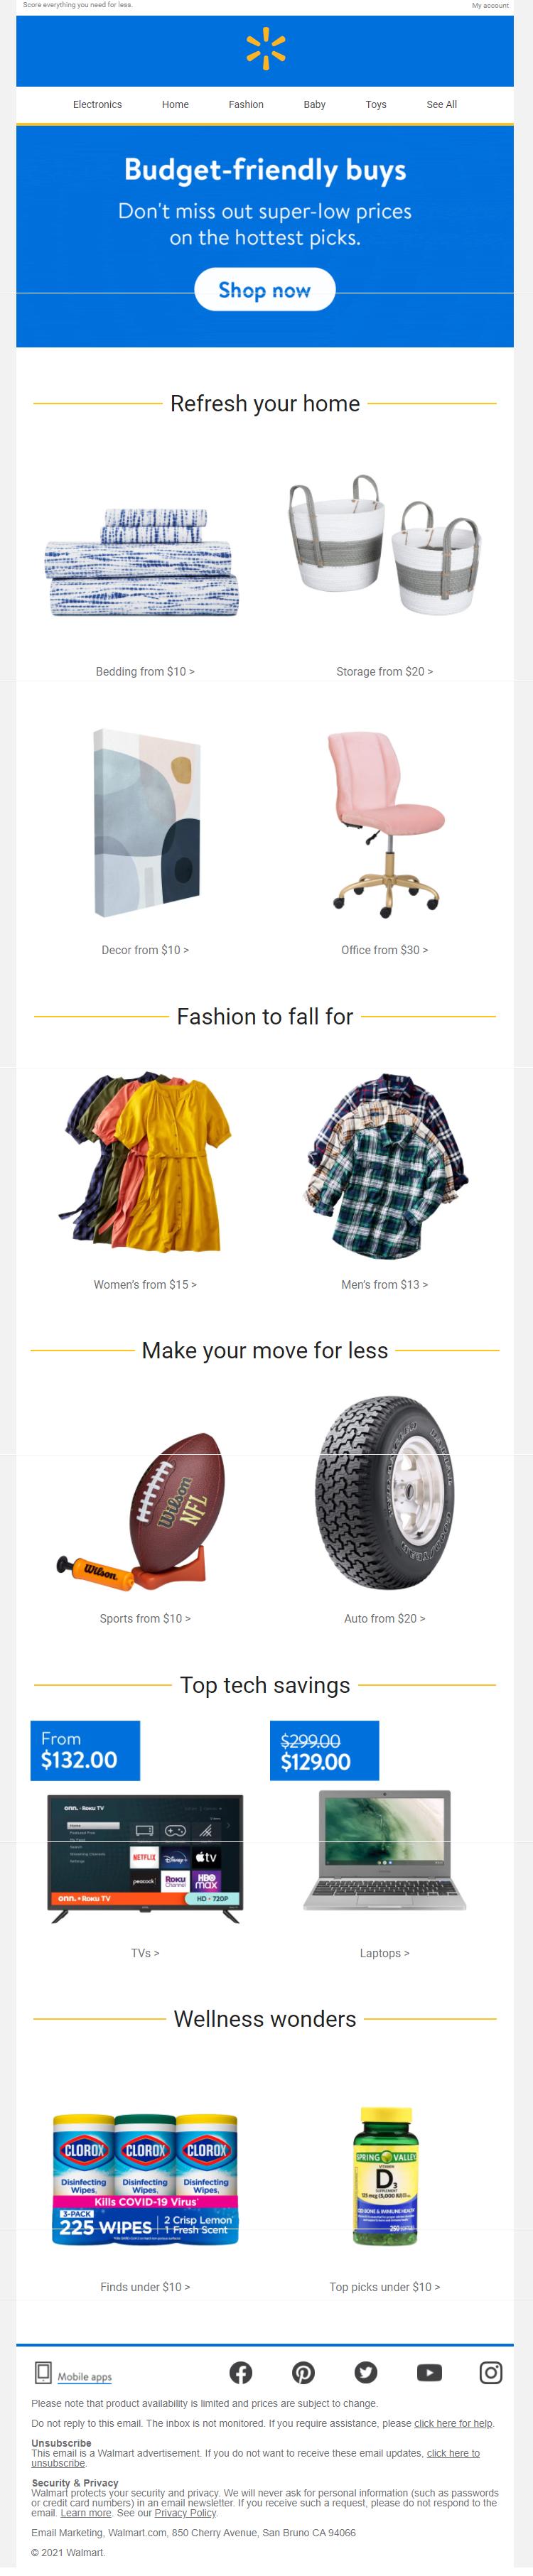 Walmart promotional image